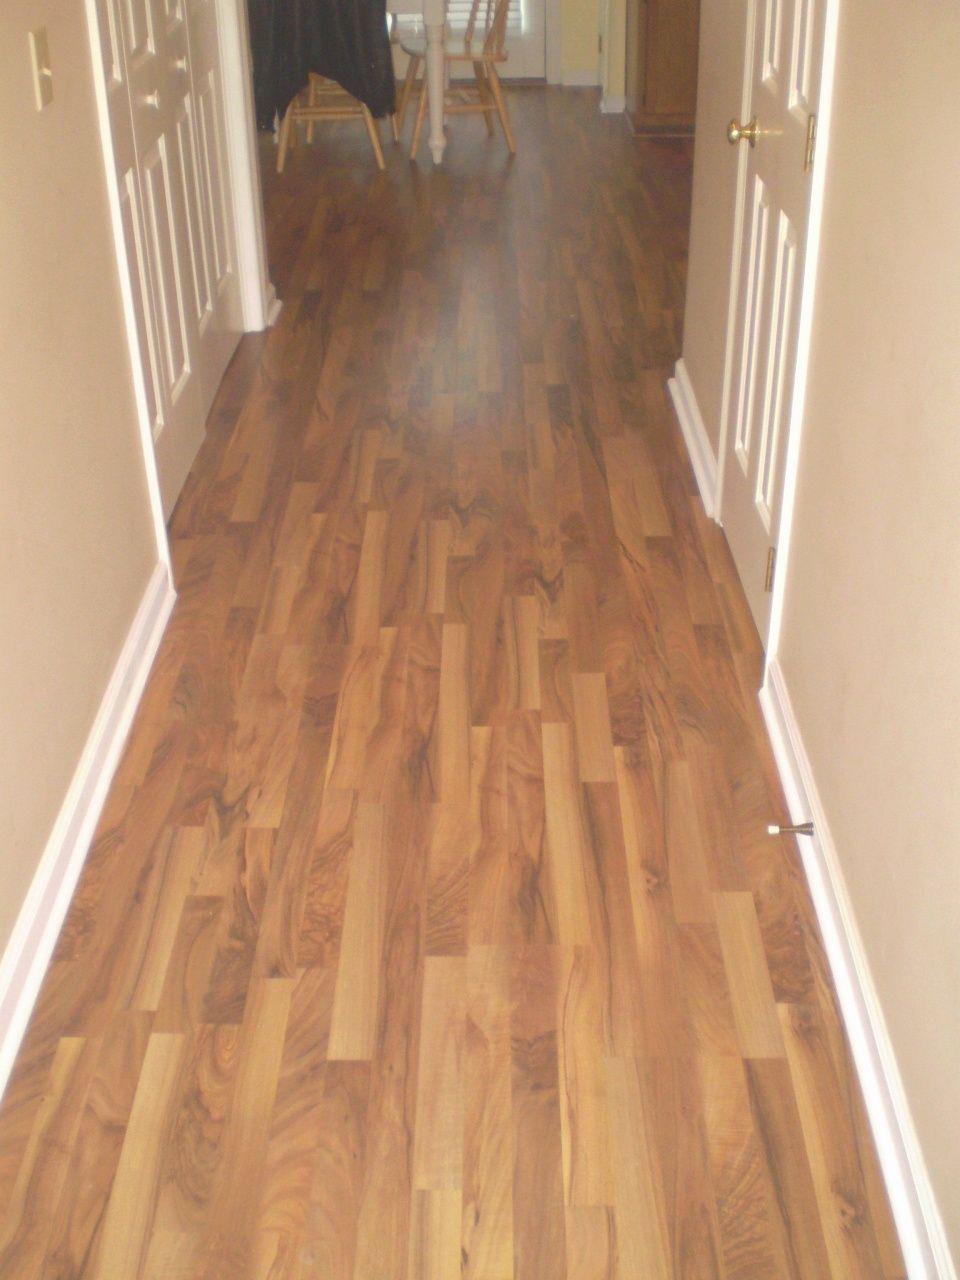 Engineered Wood Flooring Vs Laminate in 2020 Bamboo